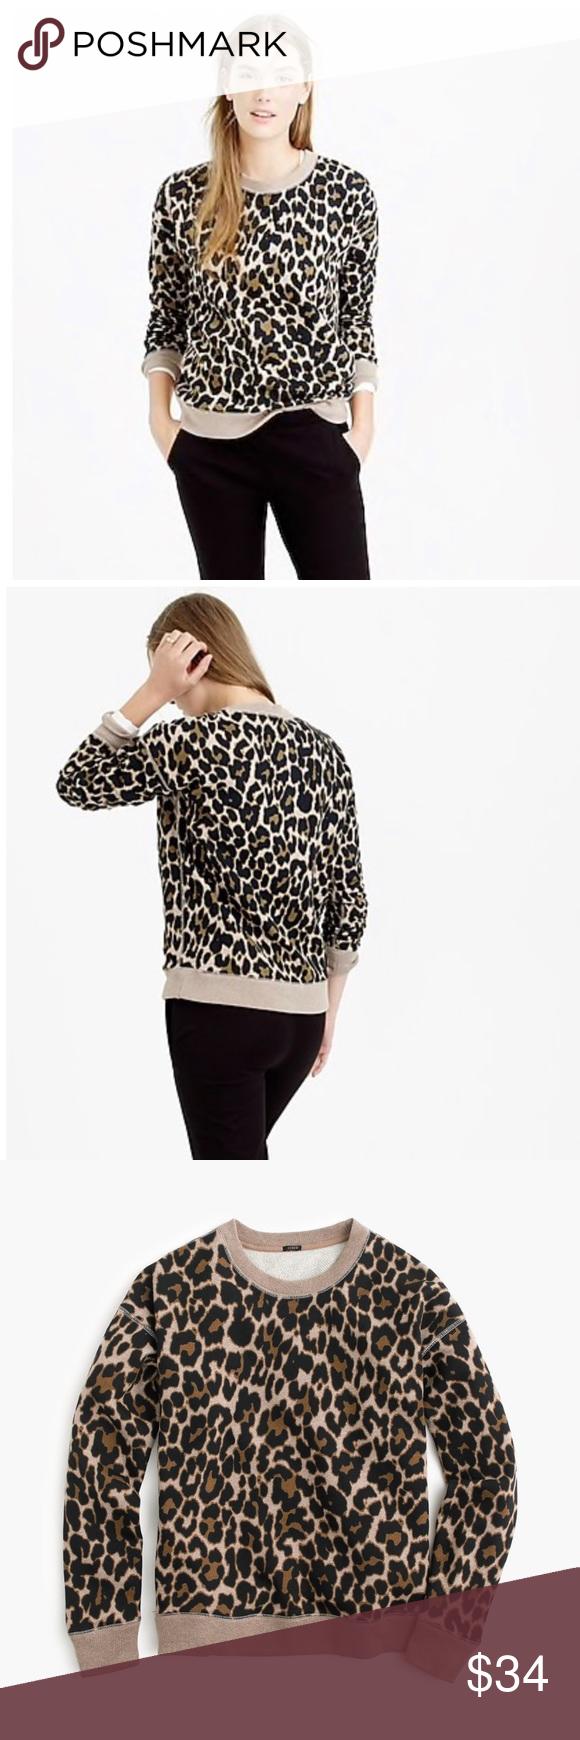 J Crew Leopard Crewneck Sweater Xxs J Crew Leopard Crewneck Sweater Xxs Black And Ta Leopard Print Sweatshirt Beautiful Sweatshirts Crew Neck Sweatshirt [ 1740 x 580 Pixel ]